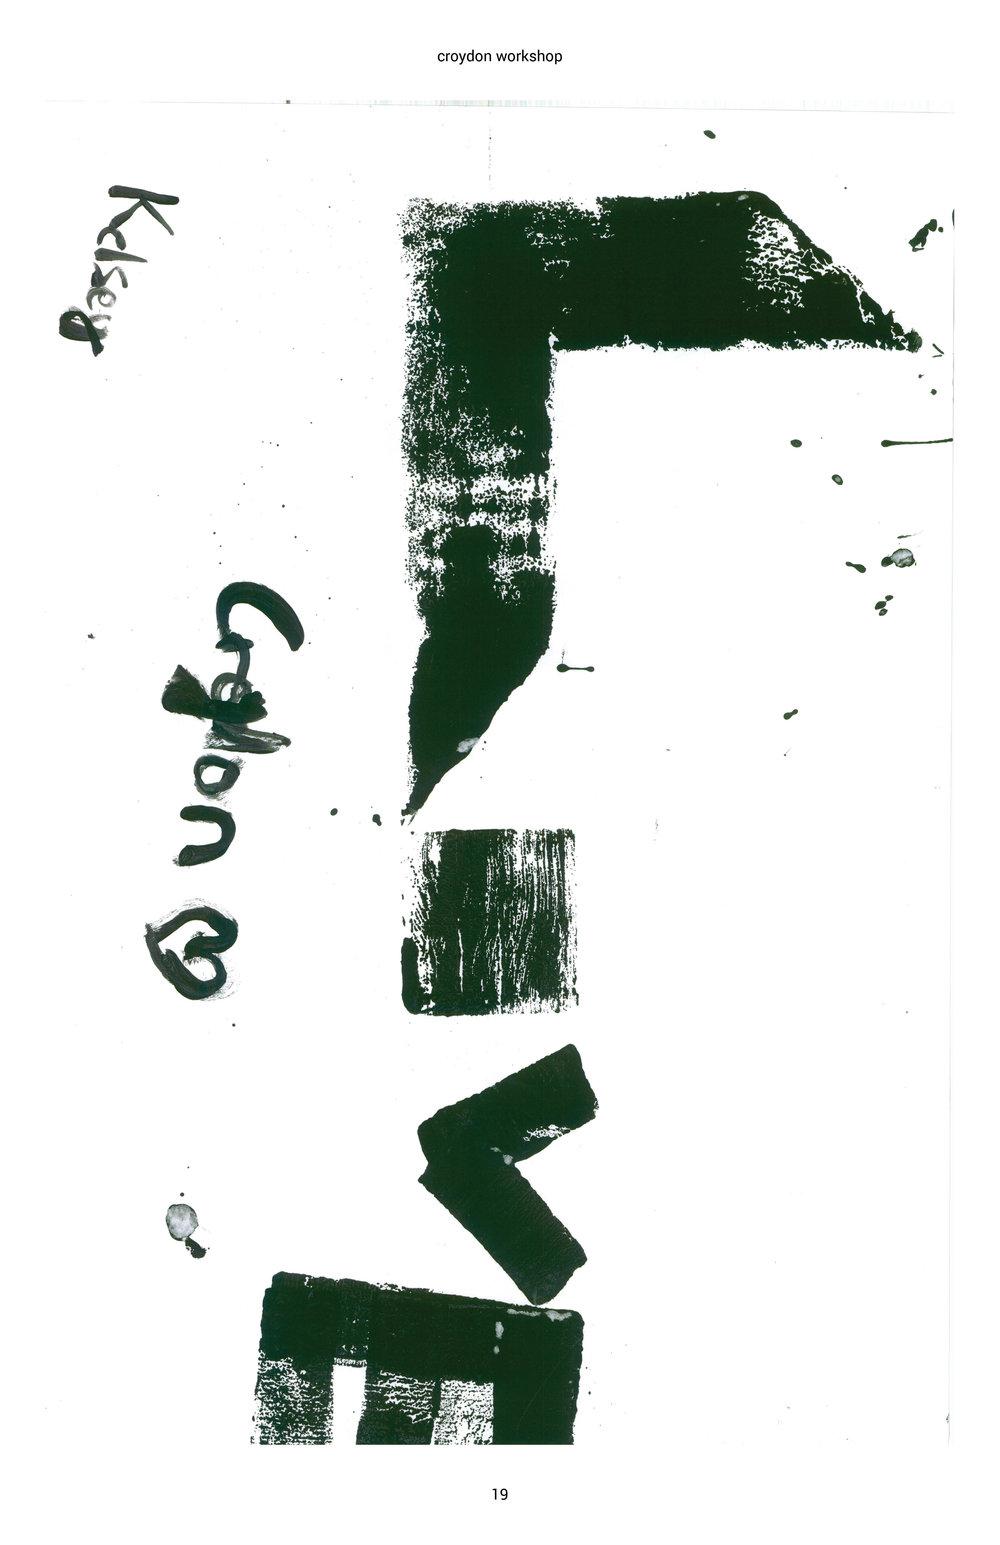 Untitled-219.jpg